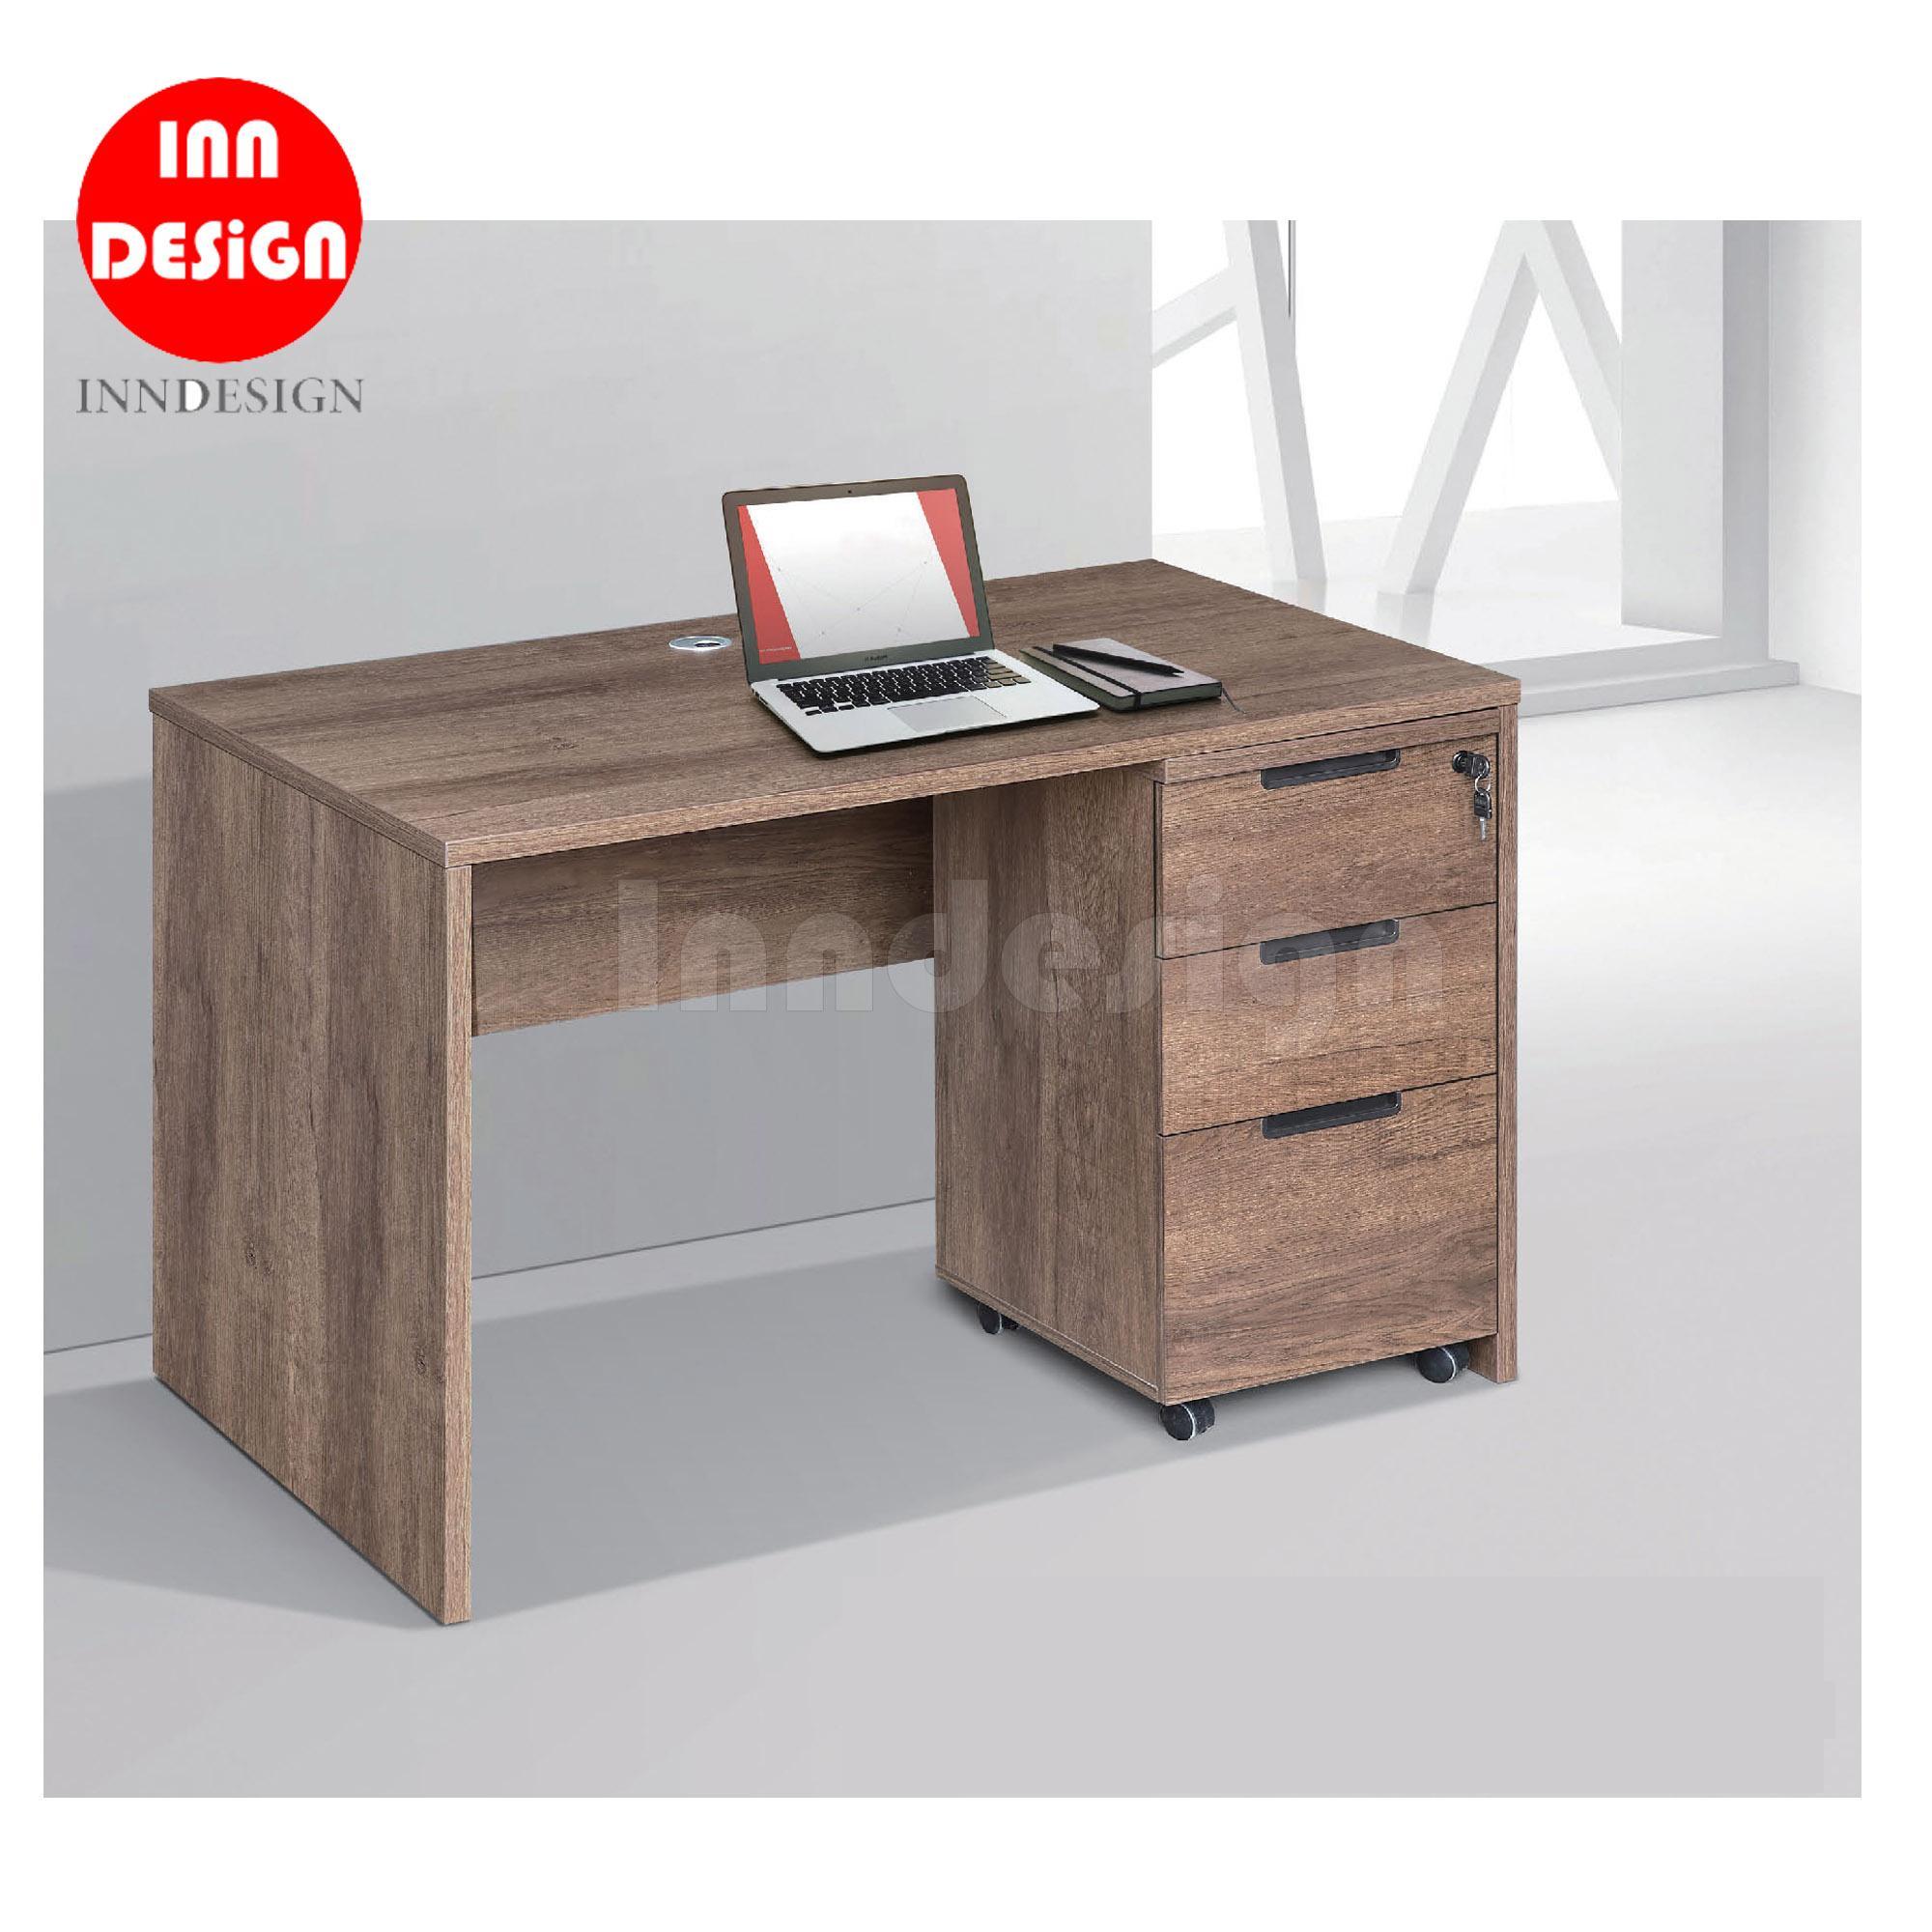 Meggie Study Table / Study Desk with Mobile Pedestal Cabinet (L100cm)